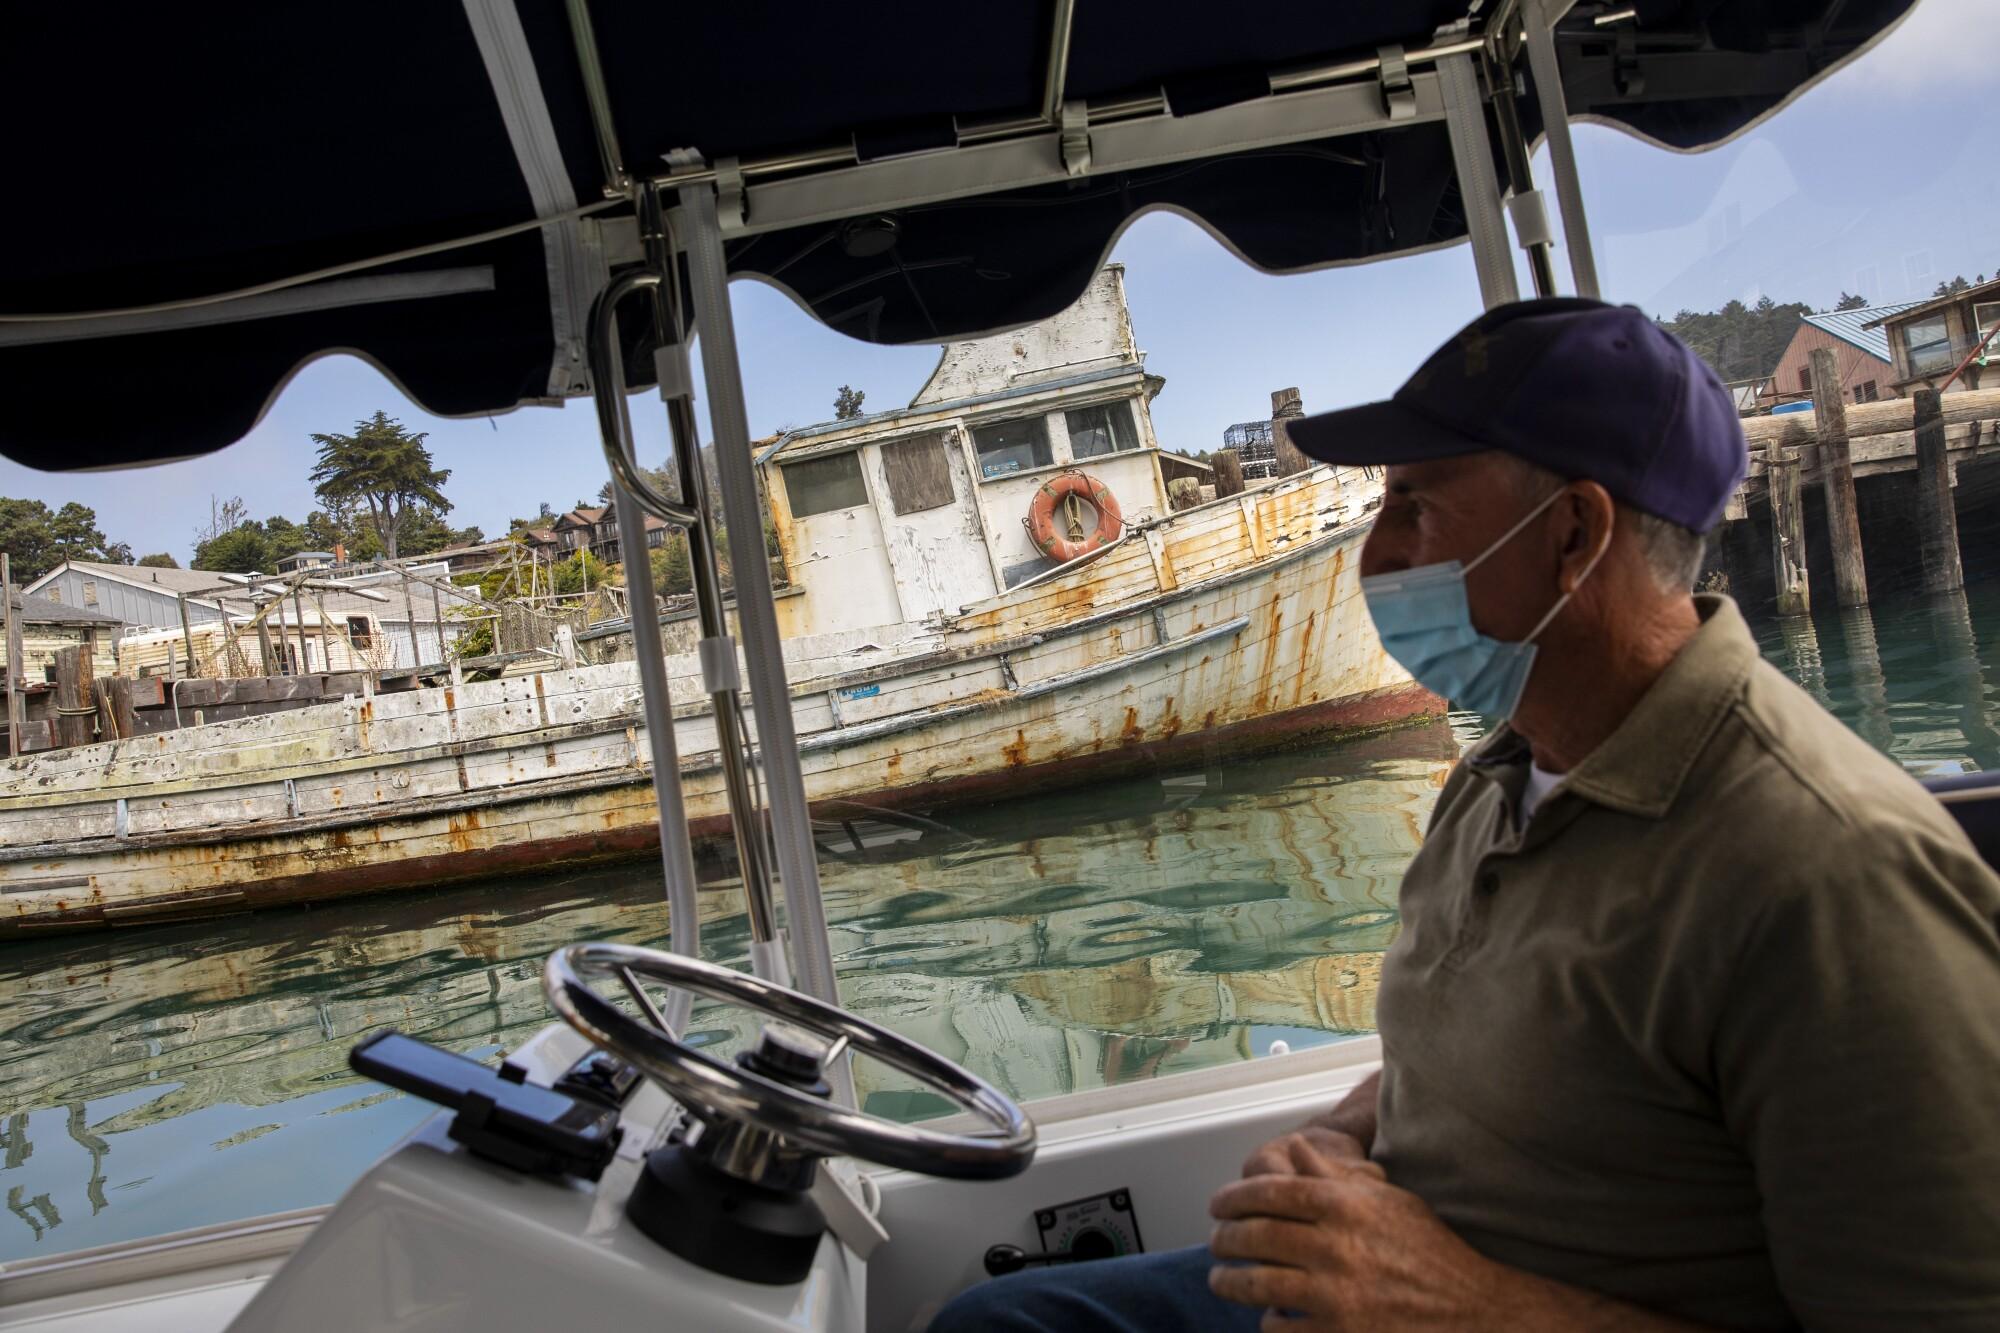 Captain Dan Platt takes people on a boat tour down the Noyo River